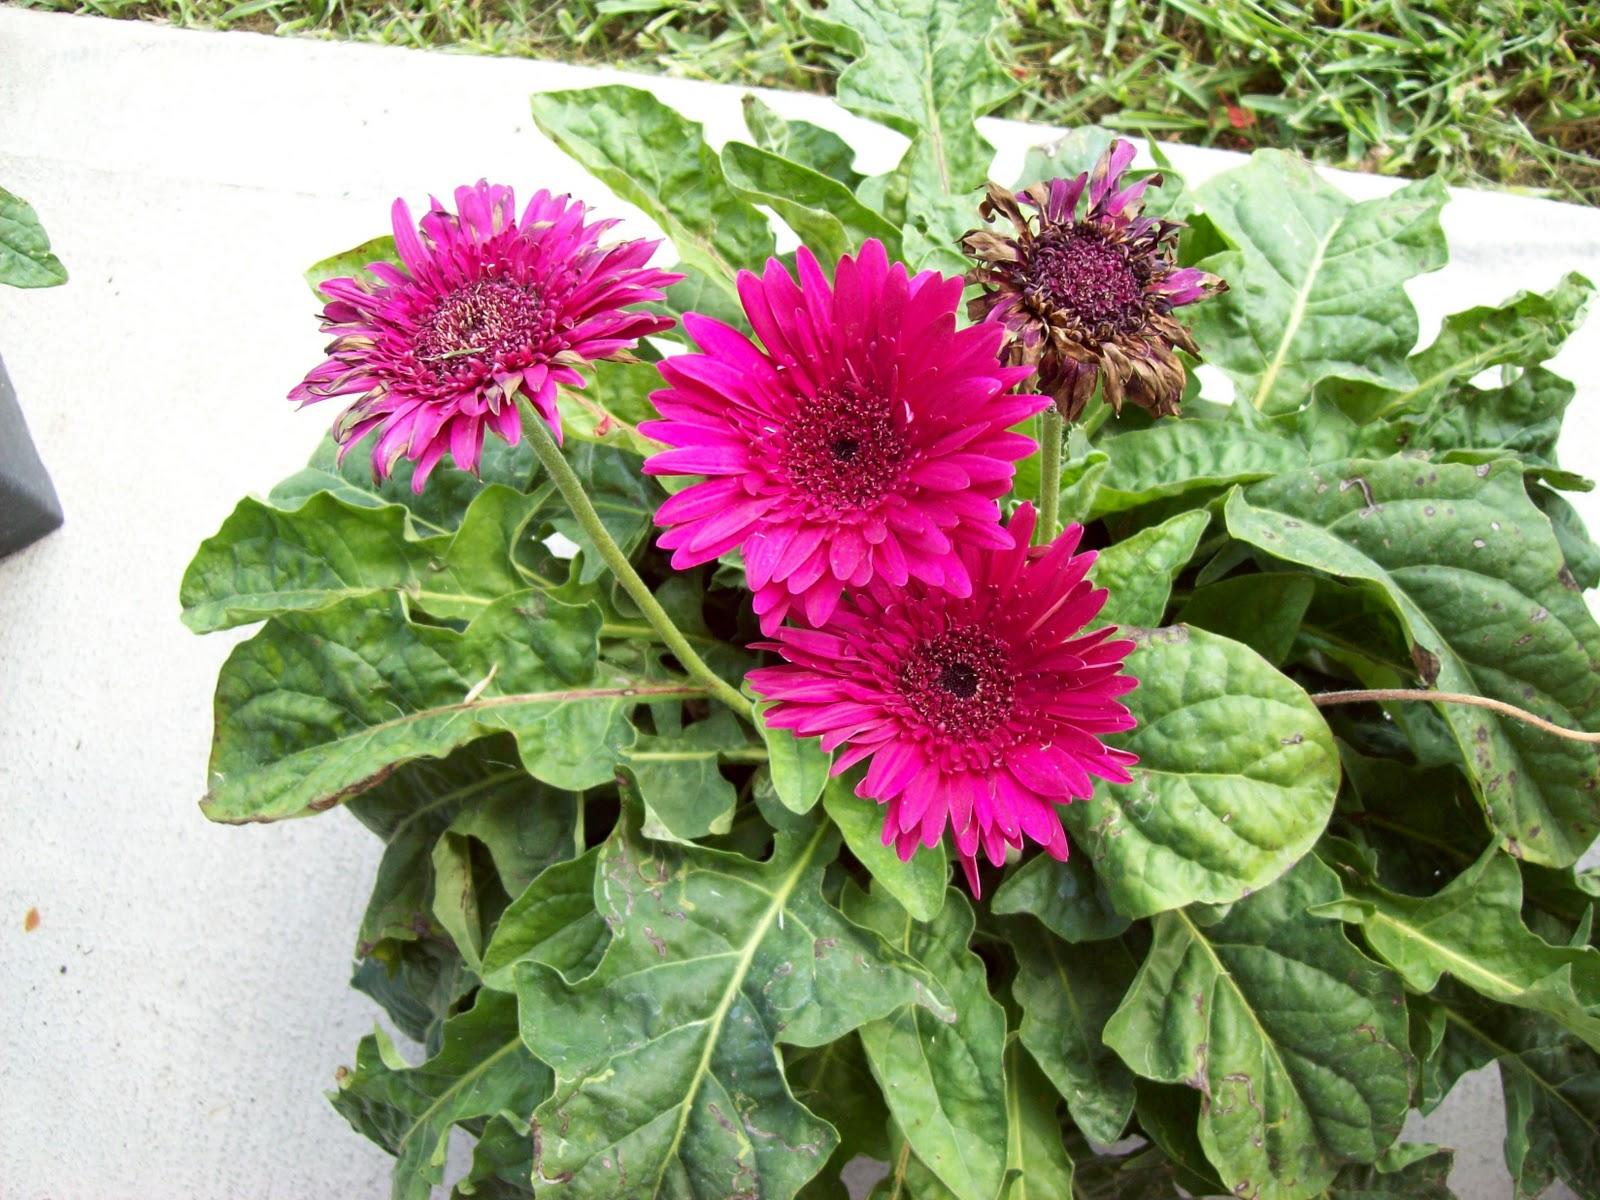 Gardening 2009 - 101_5041.JPG